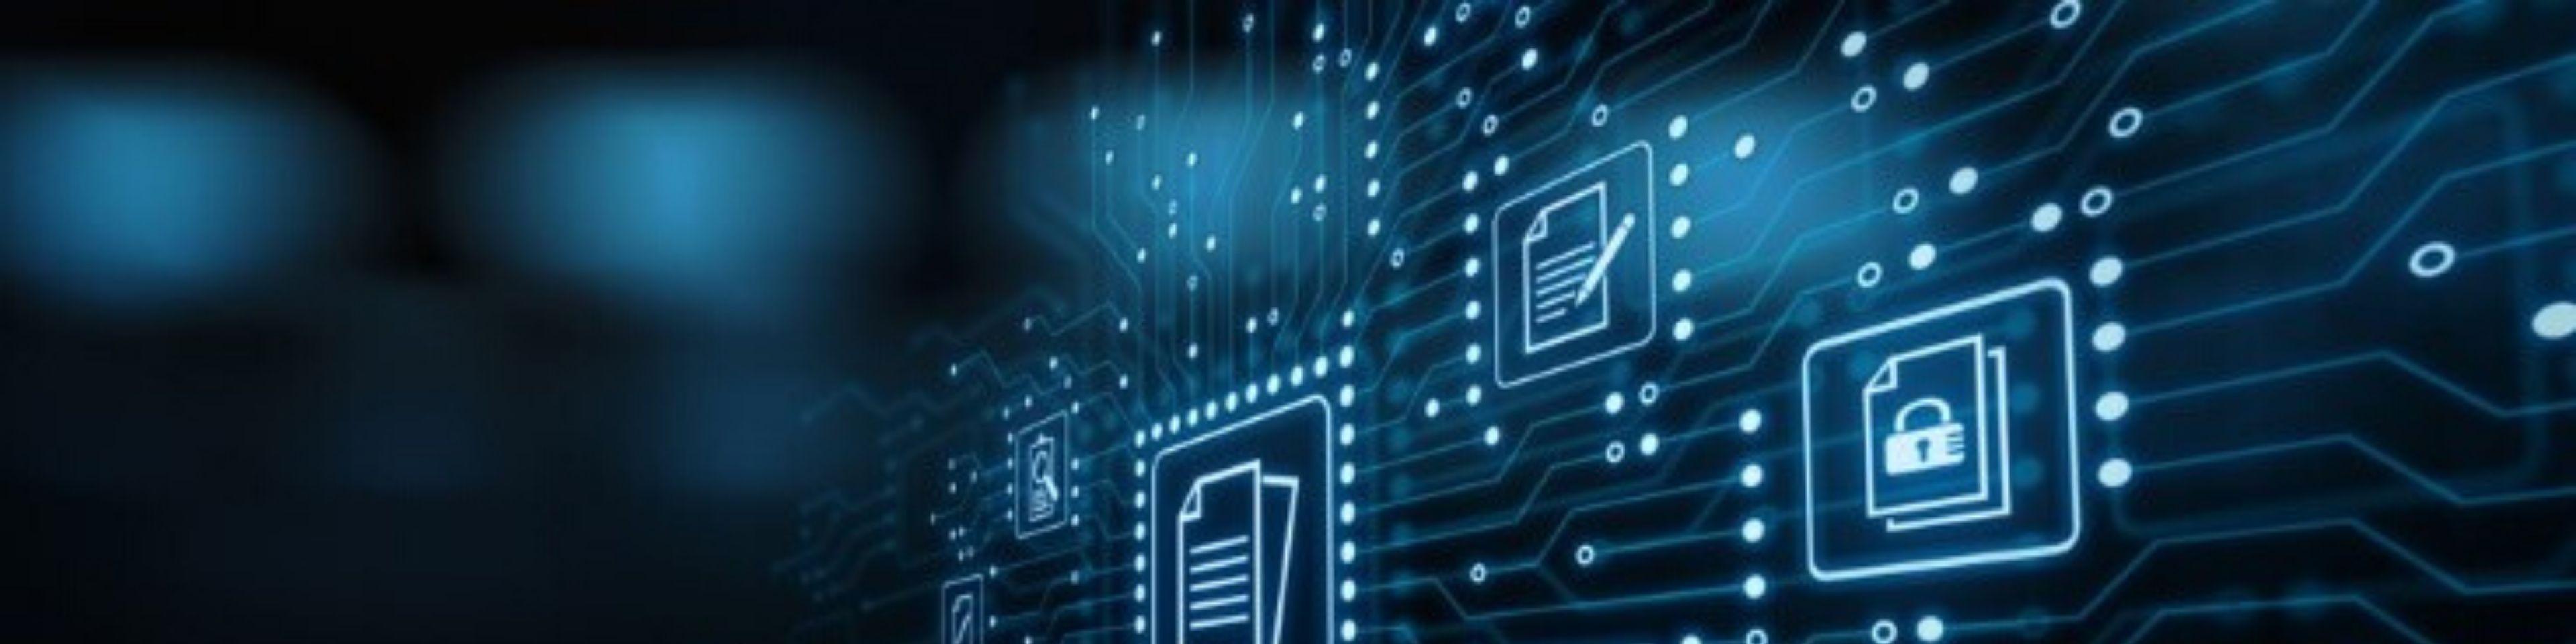 Legisway-cyber security mistakes